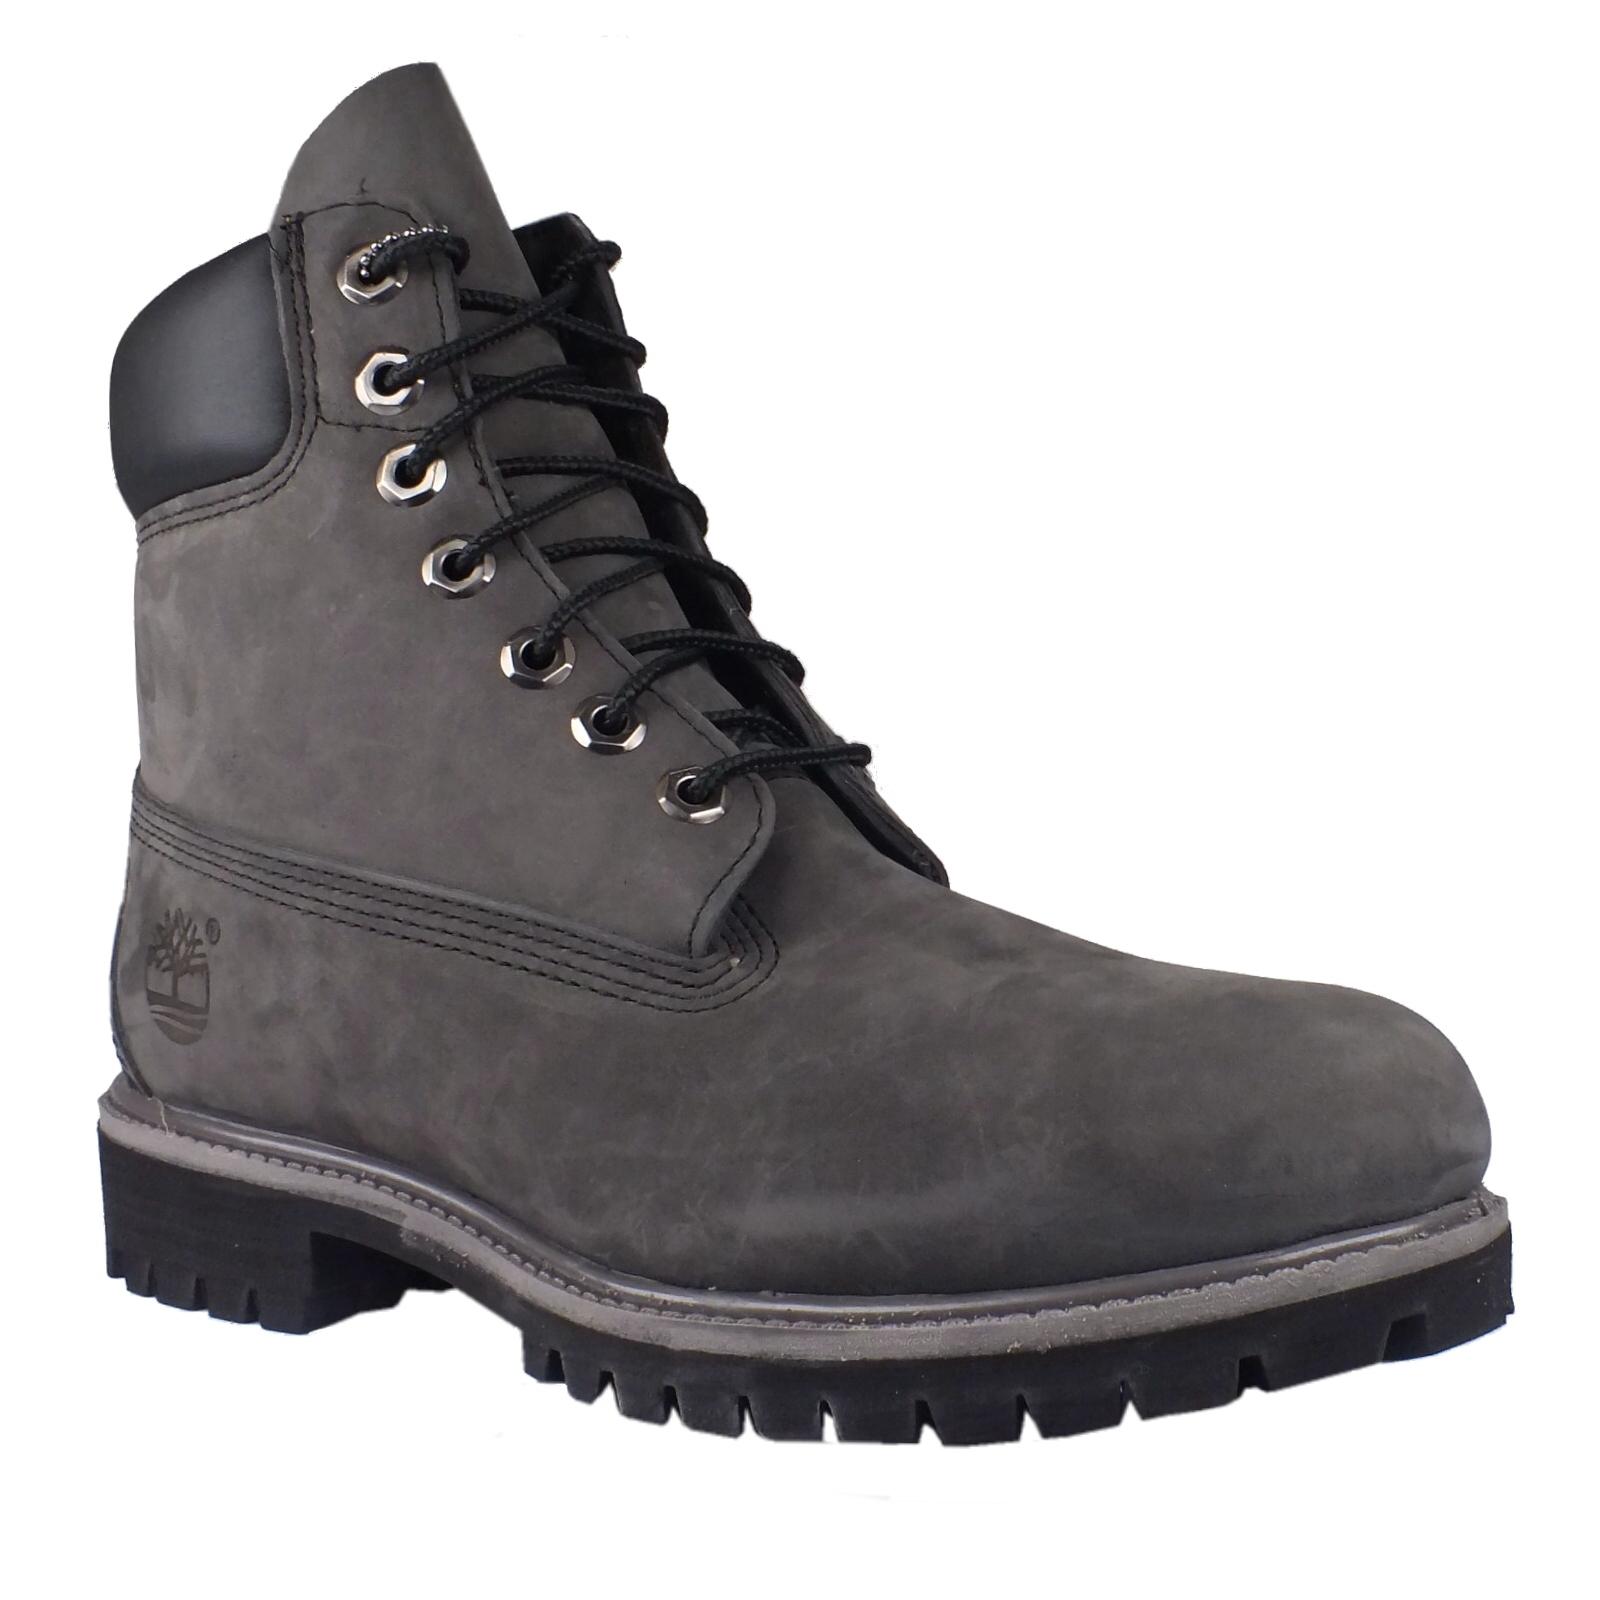 timberland 6 inch premium waterproof boot men 39 s shoes boots winterboots ebay. Black Bedroom Furniture Sets. Home Design Ideas